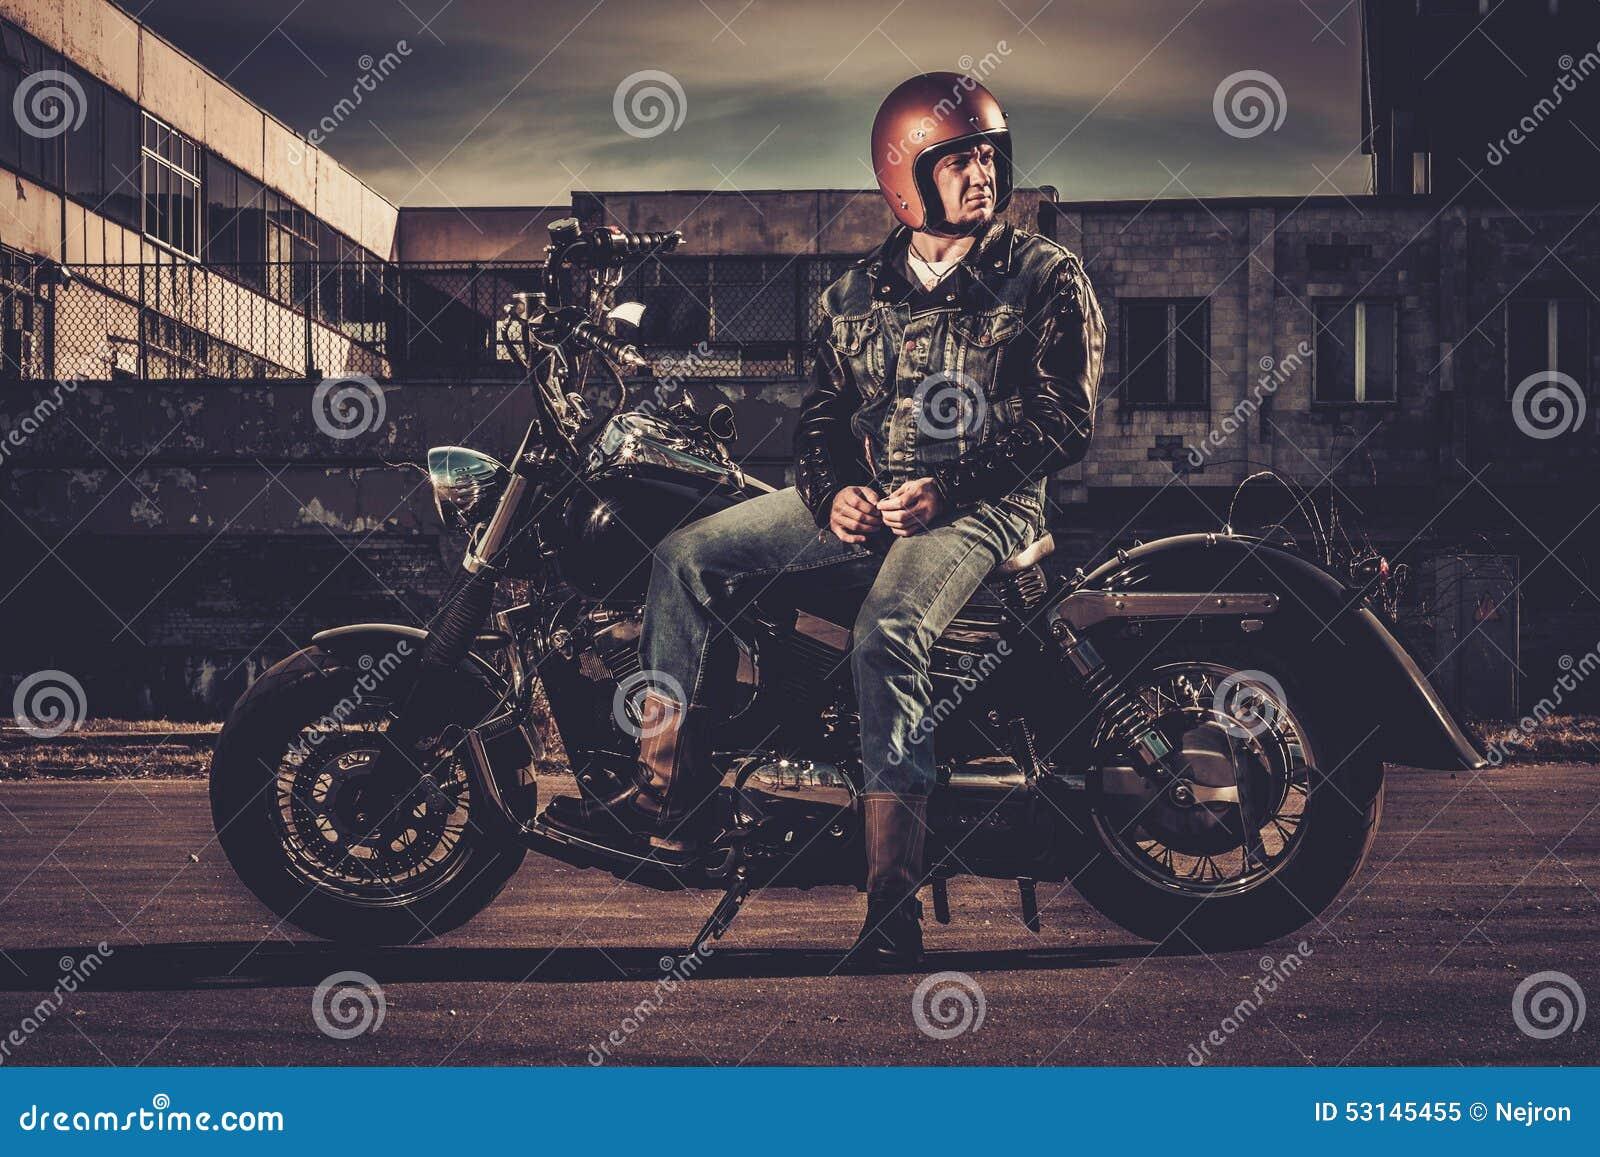 motard et sa moto de style de bobber image stock image du am ricain construit 53145455. Black Bedroom Furniture Sets. Home Design Ideas